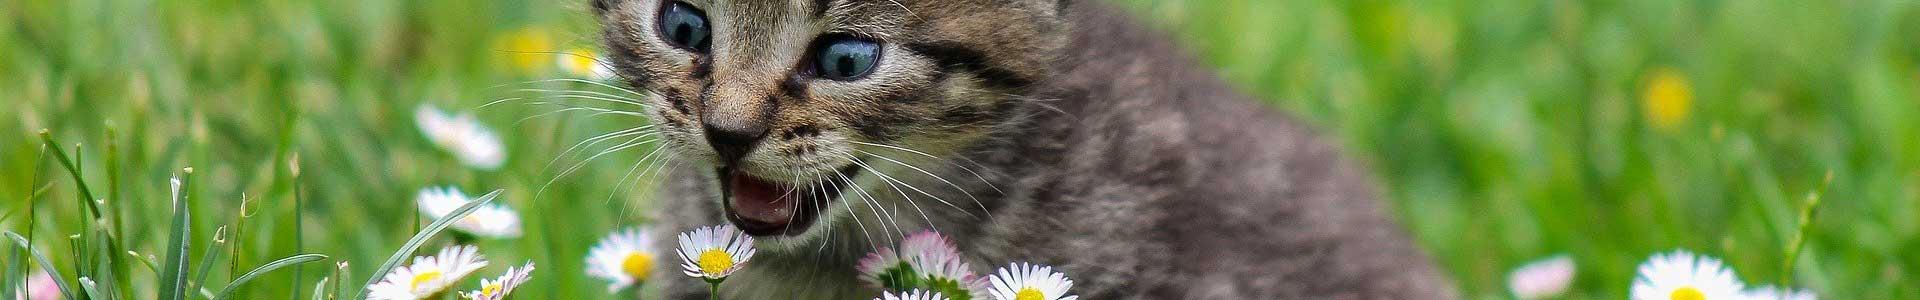 Katzenbedarf-Test